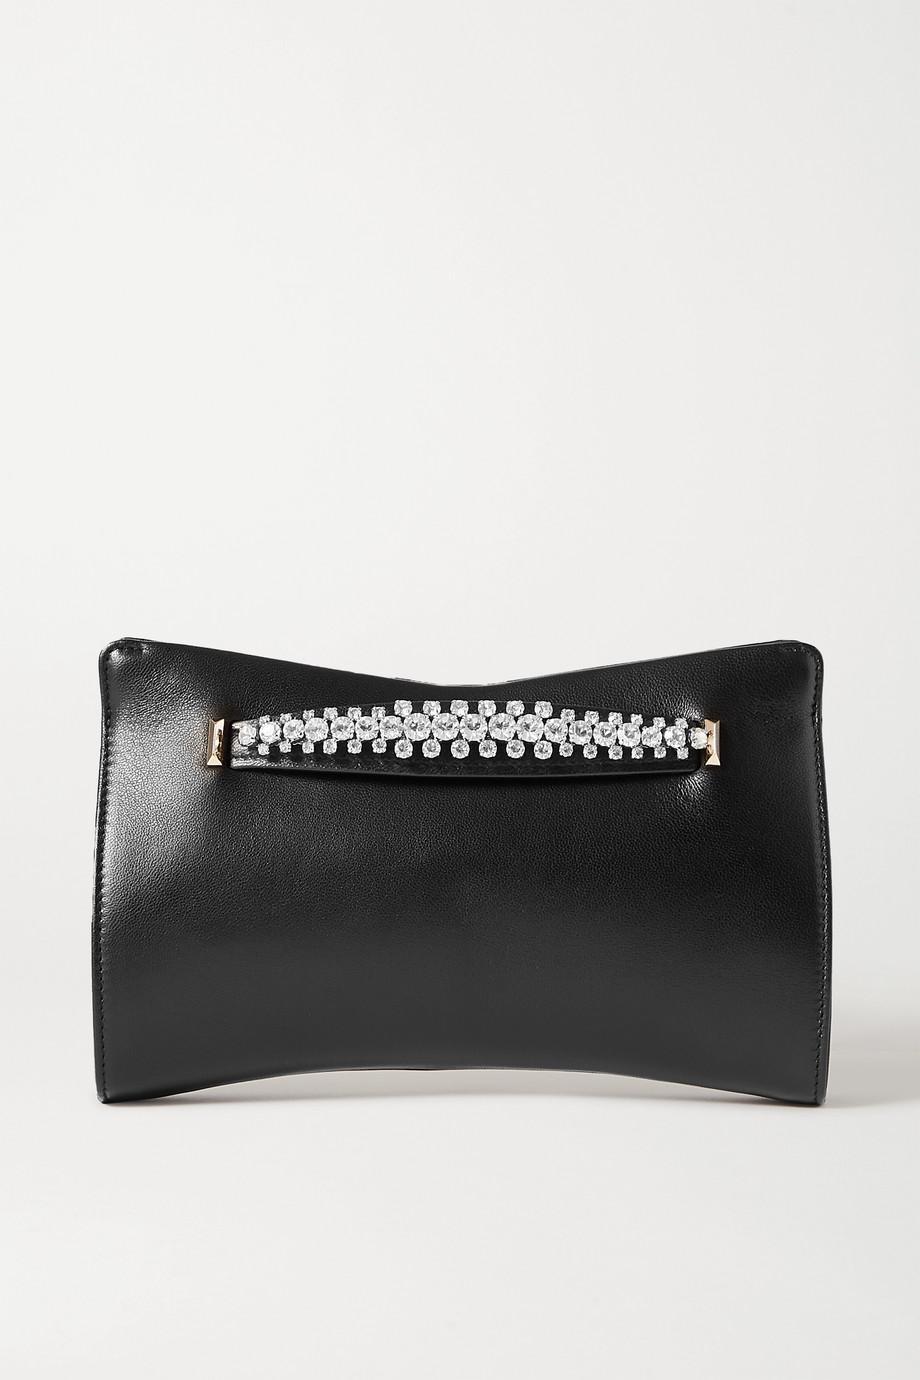 Jimmy Choo Venus crystal-embellished leather clutch